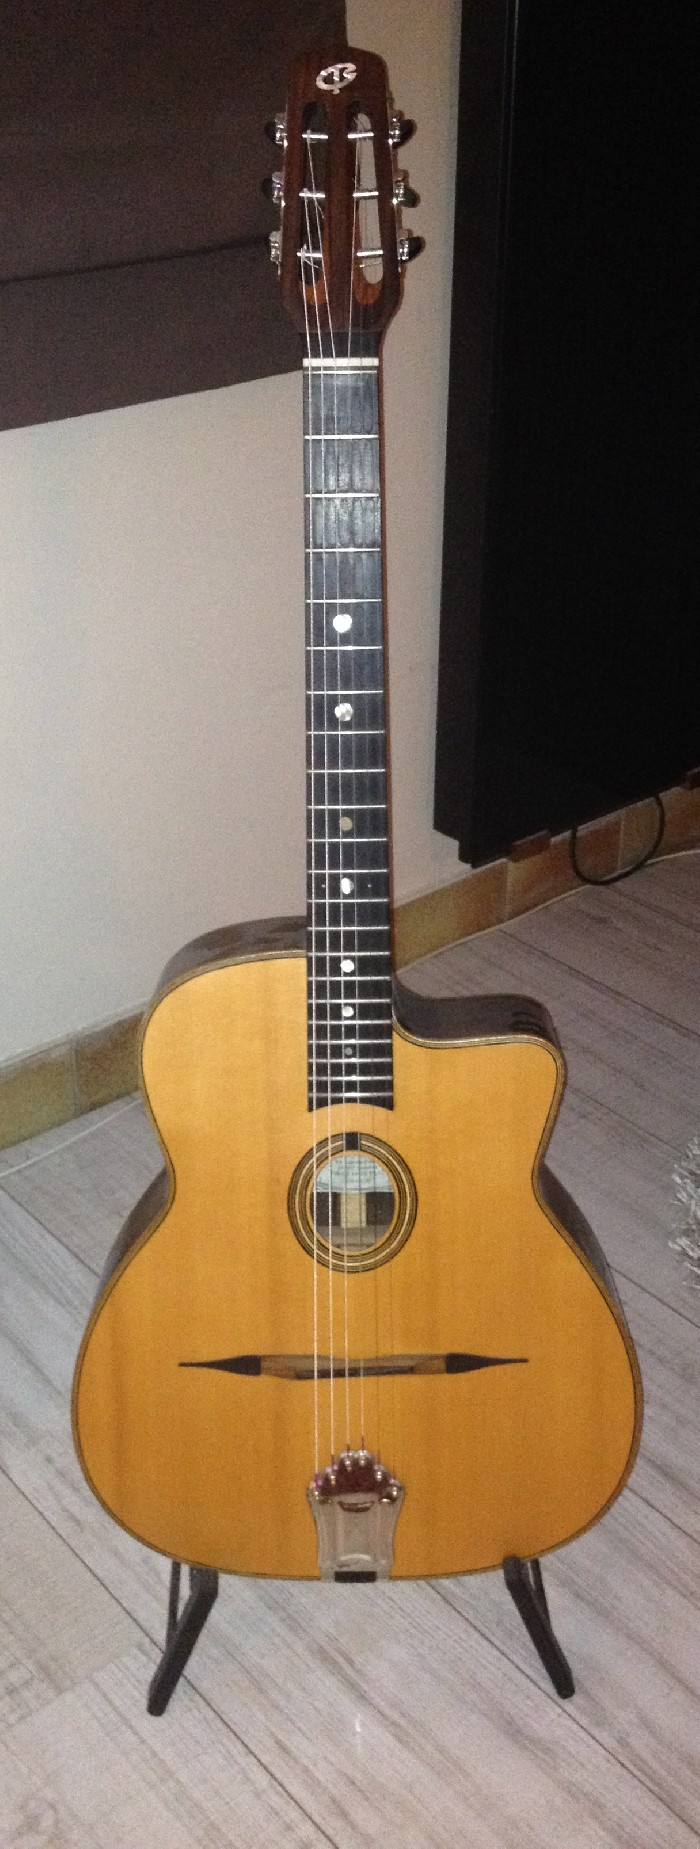 guitare classique gilles pourtoy n 94 vendre. Black Bedroom Furniture Sets. Home Design Ideas